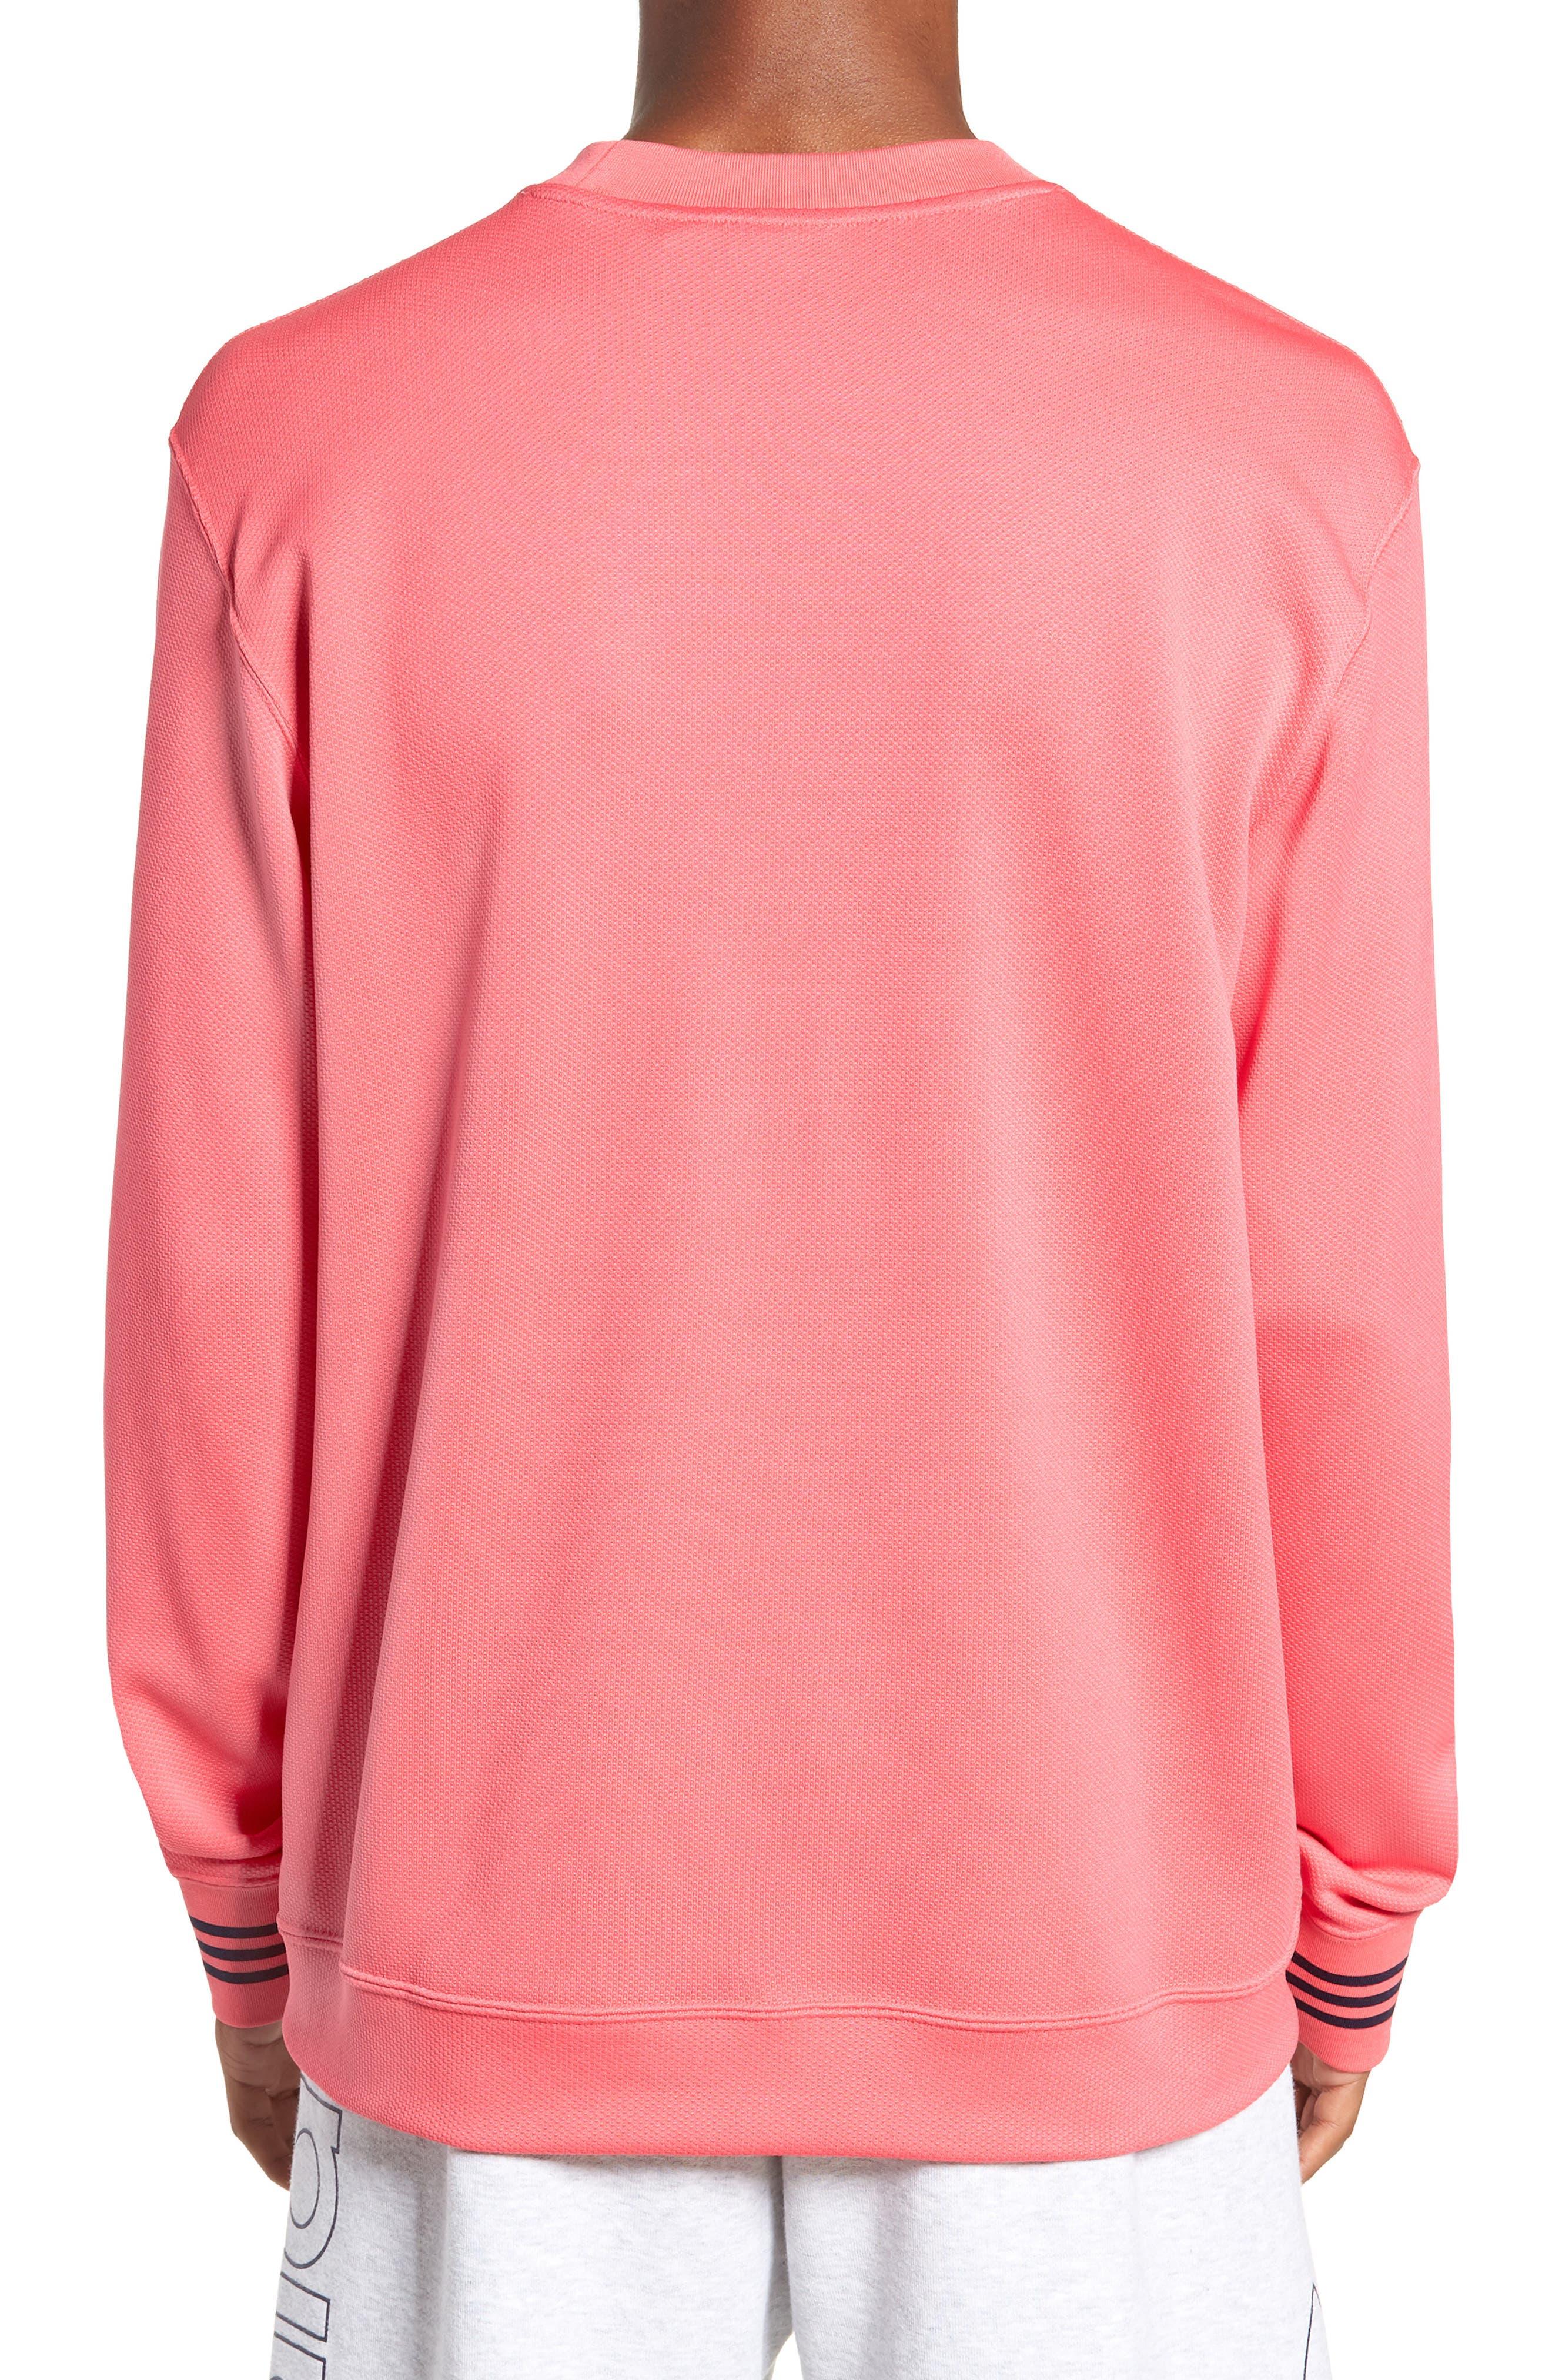 ADIDAS ORIGINALS, Piqué Long Sleeve T-Shirt, Alternate thumbnail 2, color, REAL PINK